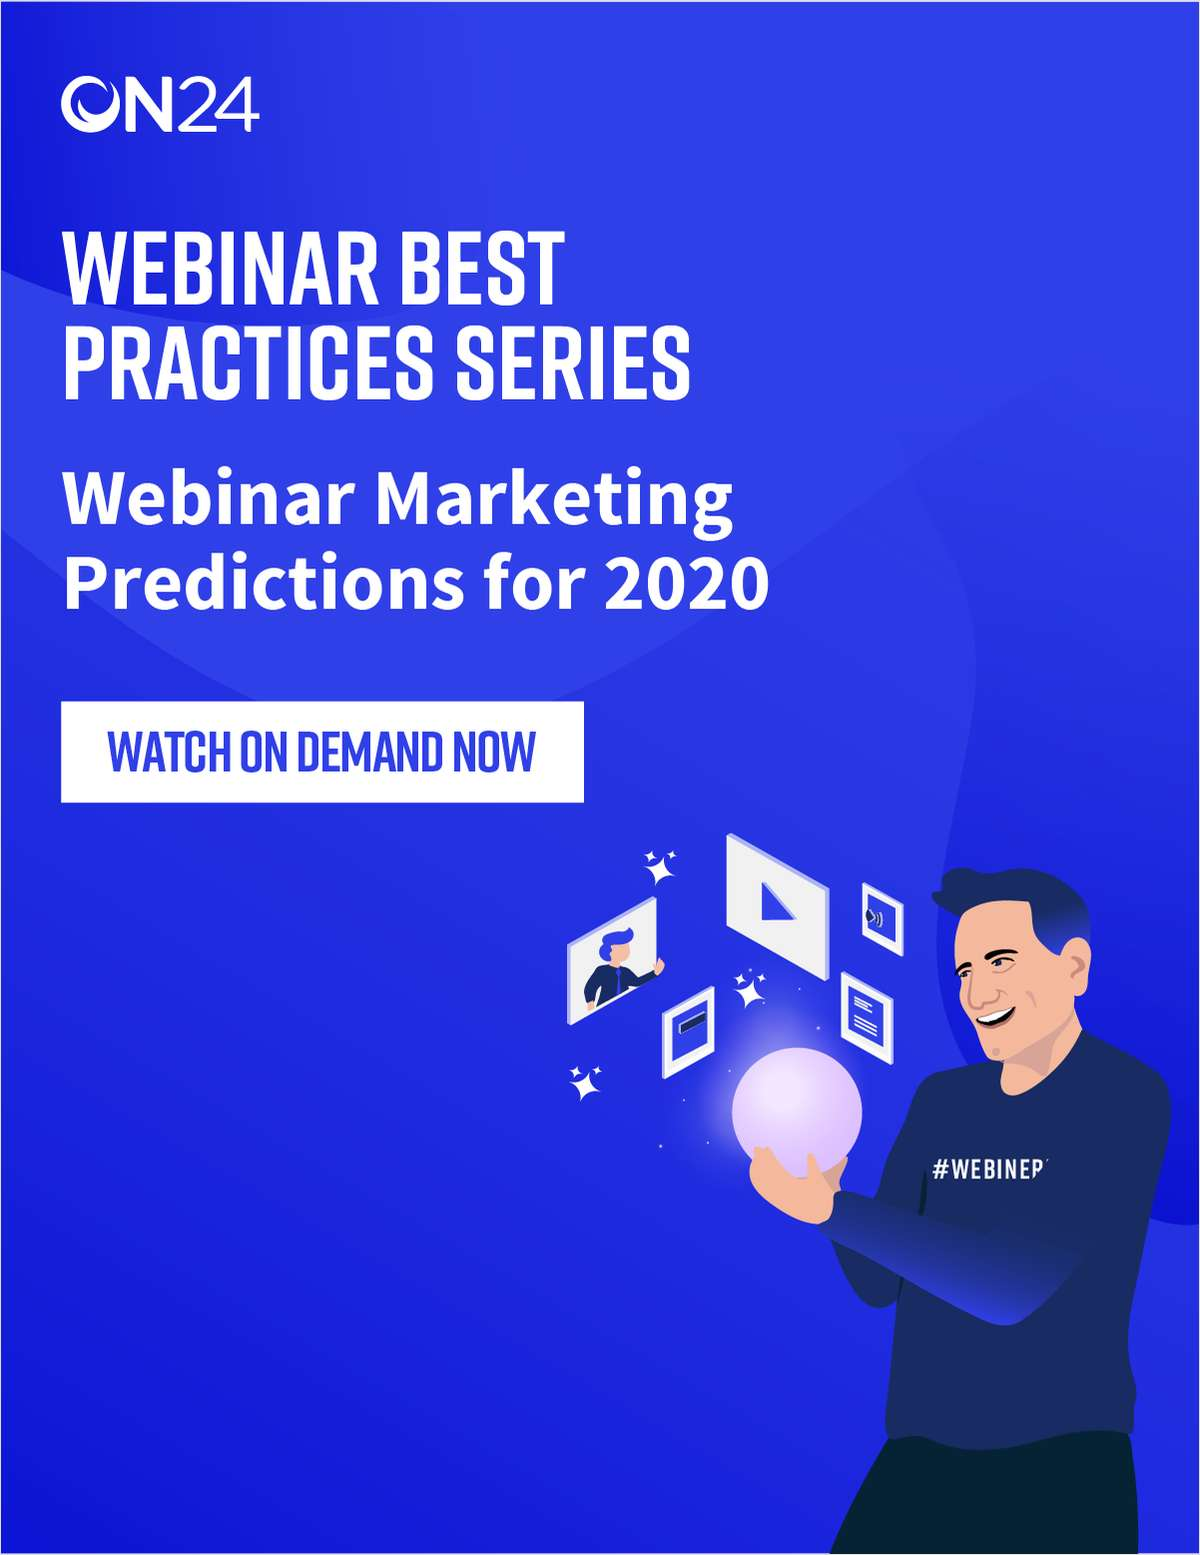 Webinar Marketing Predictions for 2020